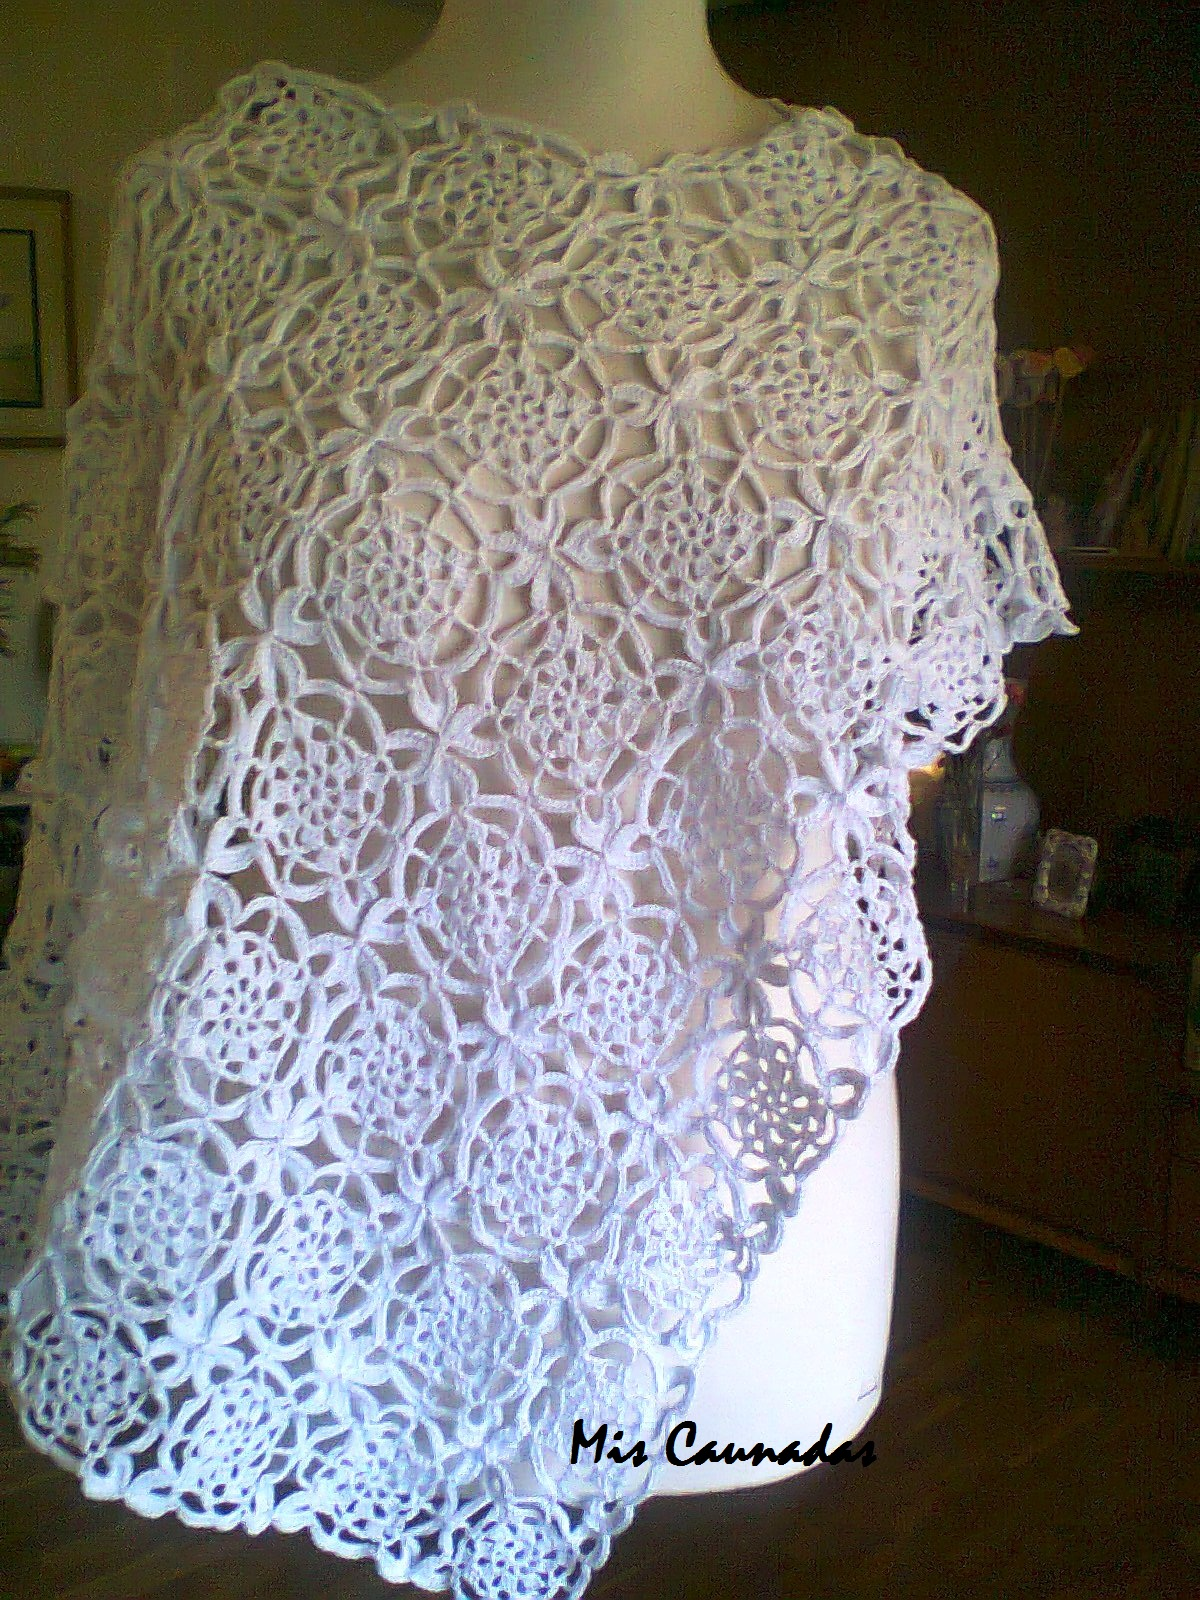 Aplicaciones a crochet cuadradas imagui - Aplicaciones de crochet para colchas ...